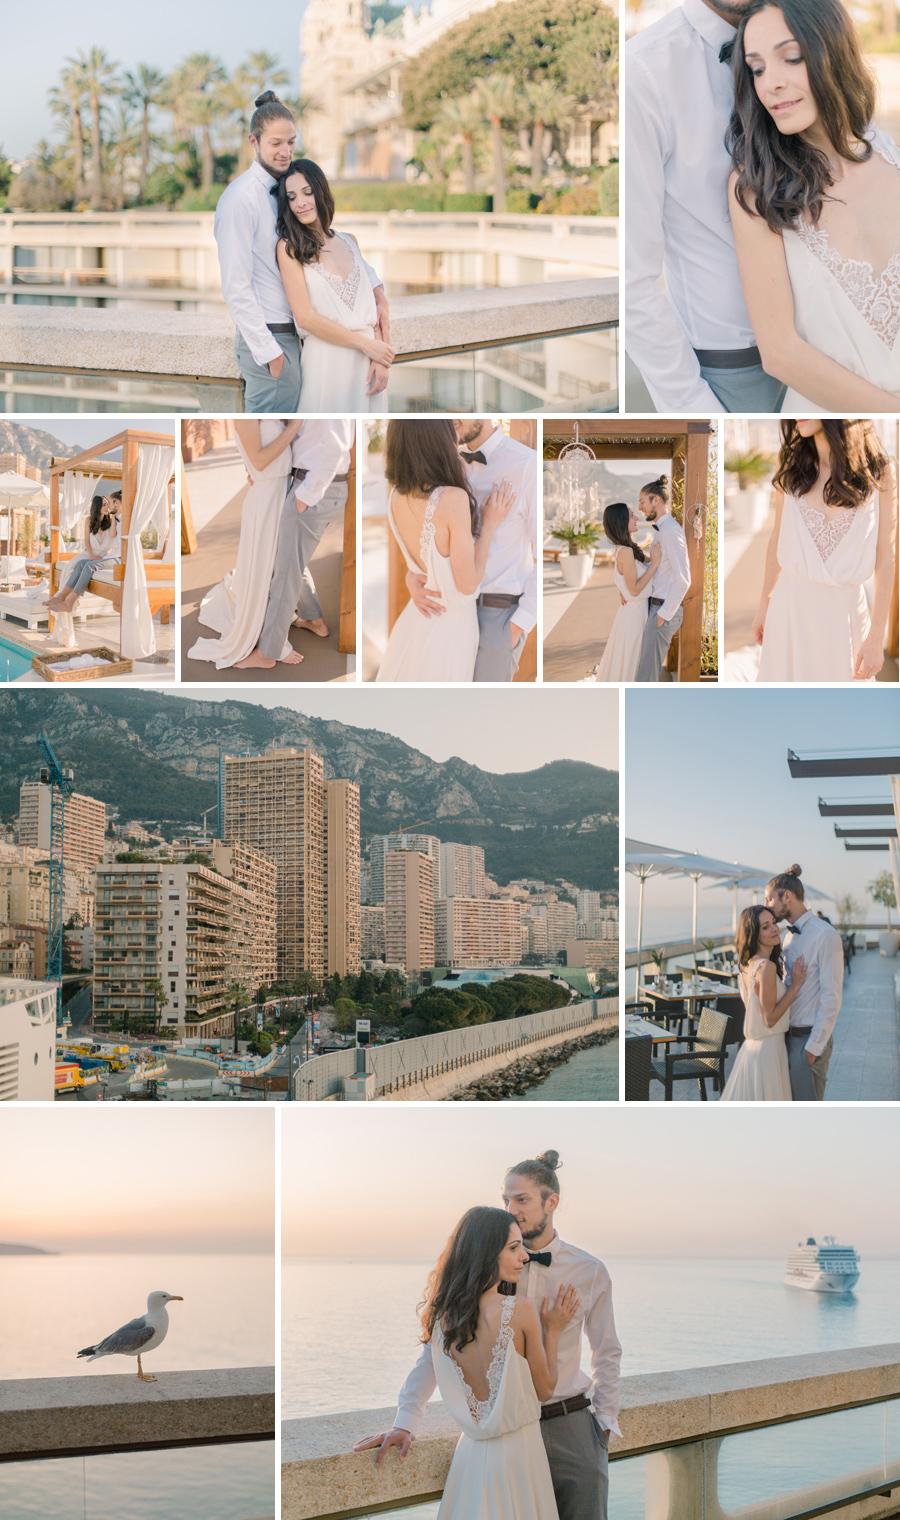 wedding photographer monaco fairmont docquin